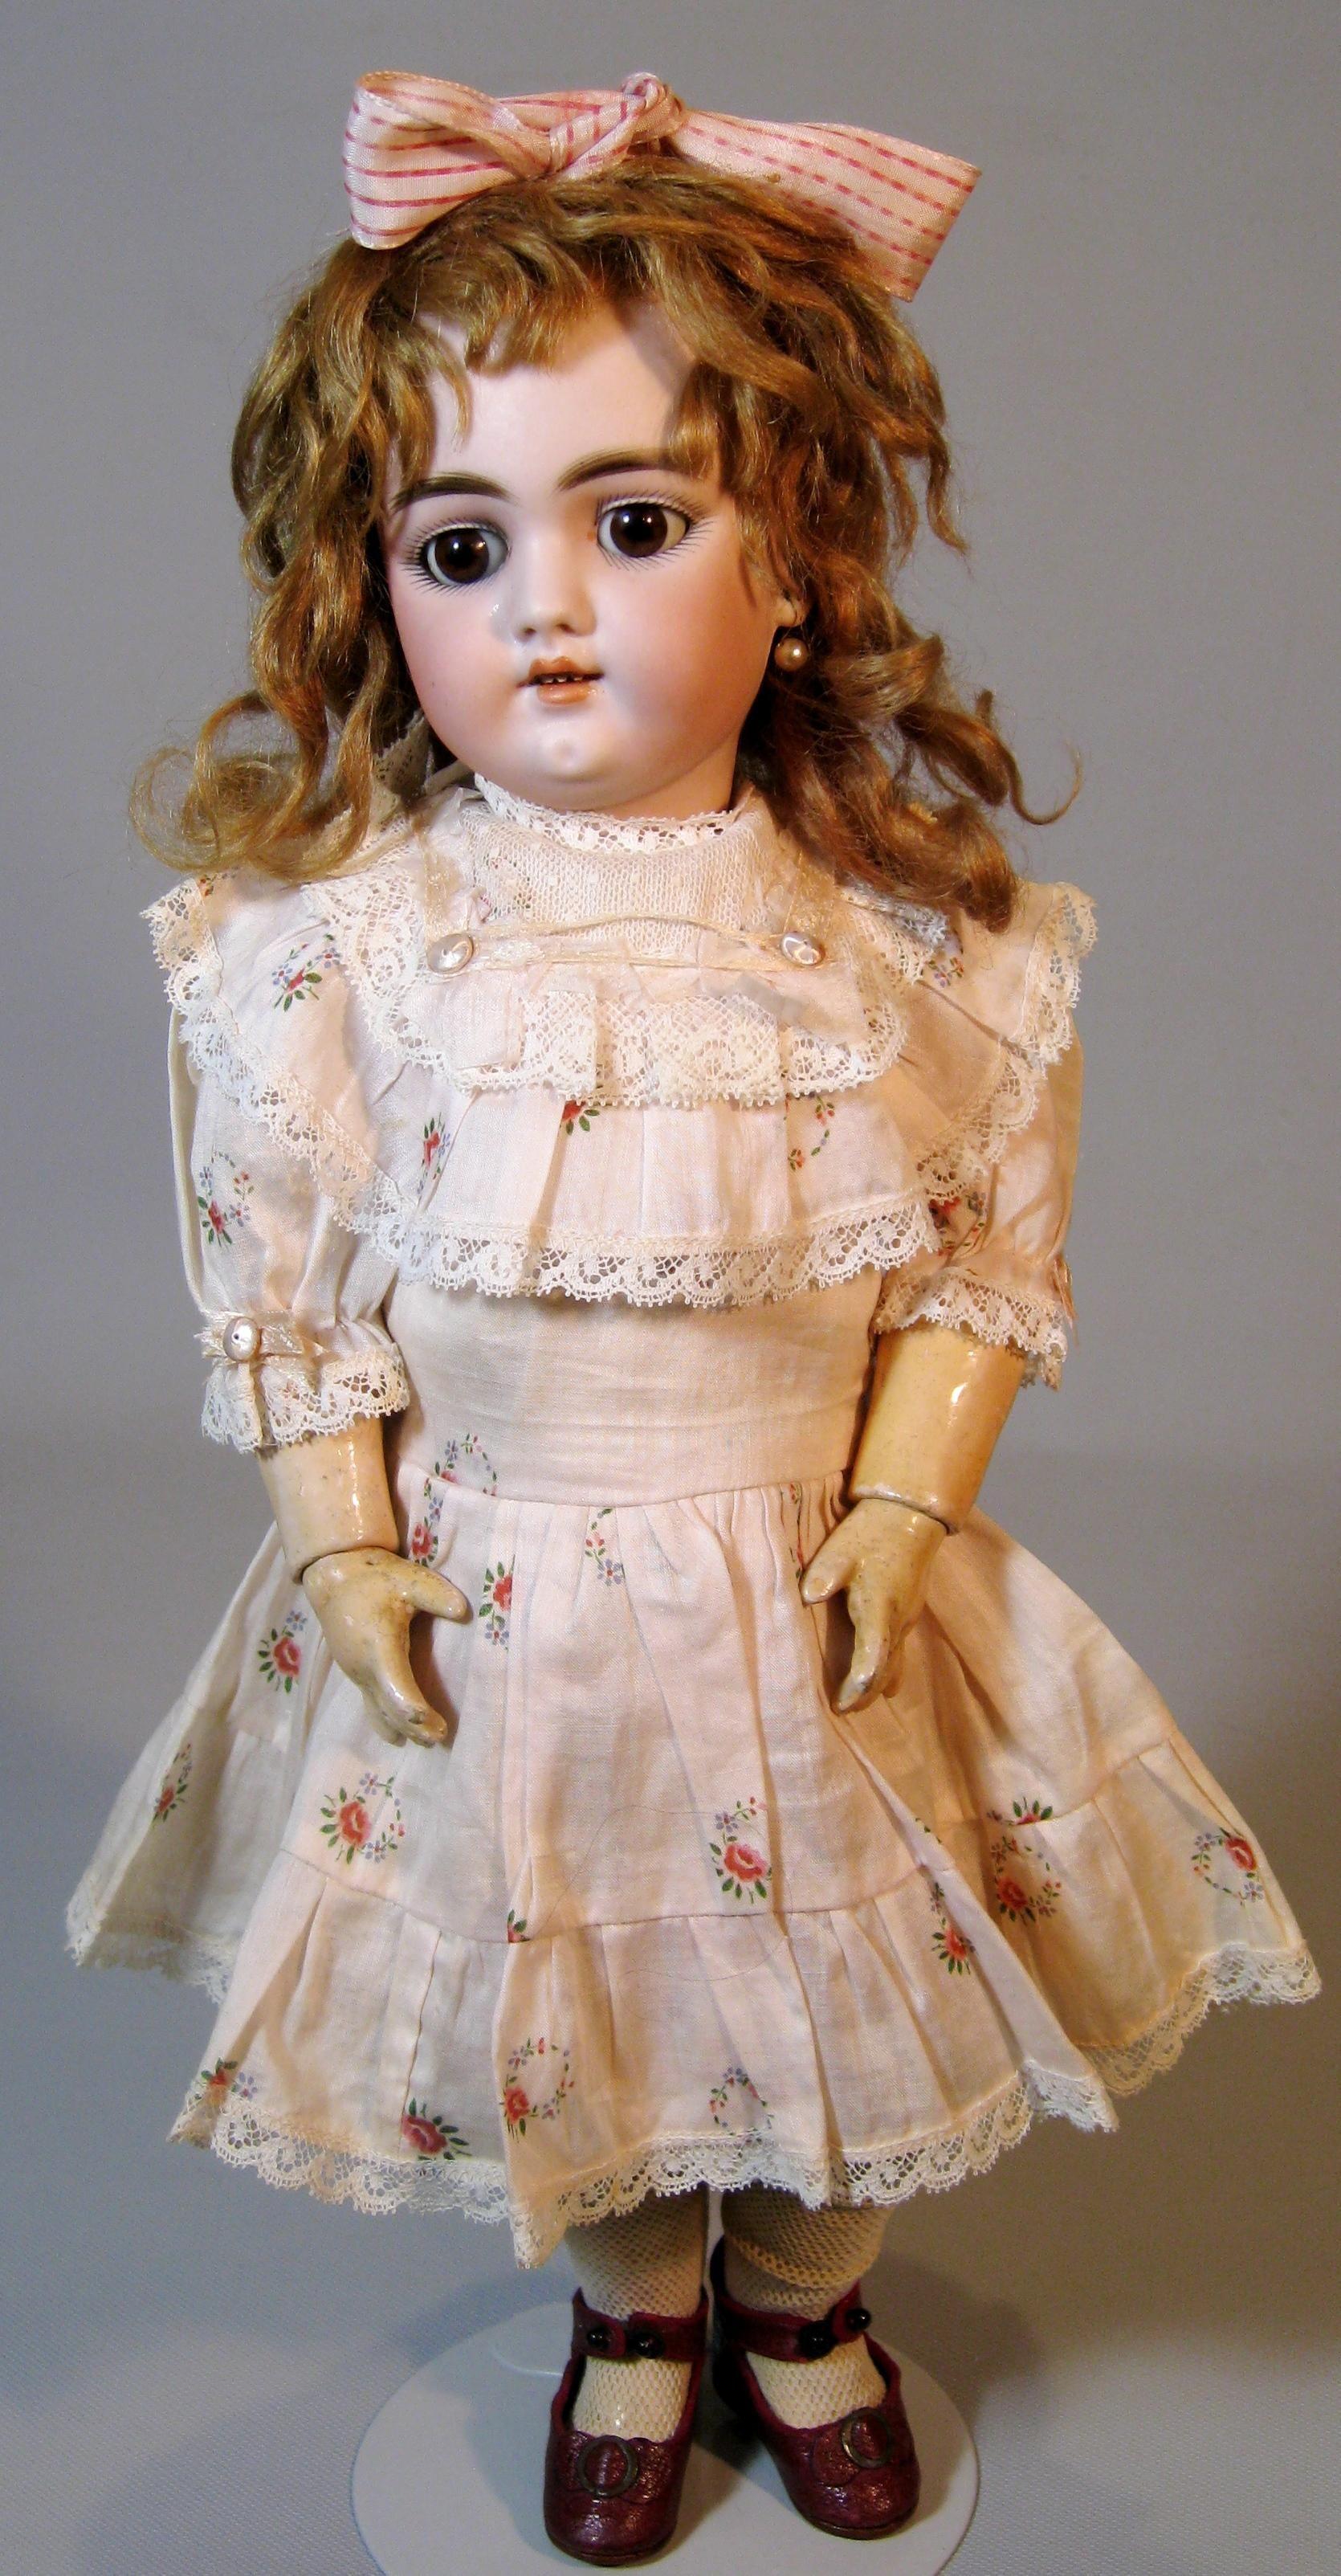 Gorgeous Antique Handwerck 109 German Bisque Head Doll from